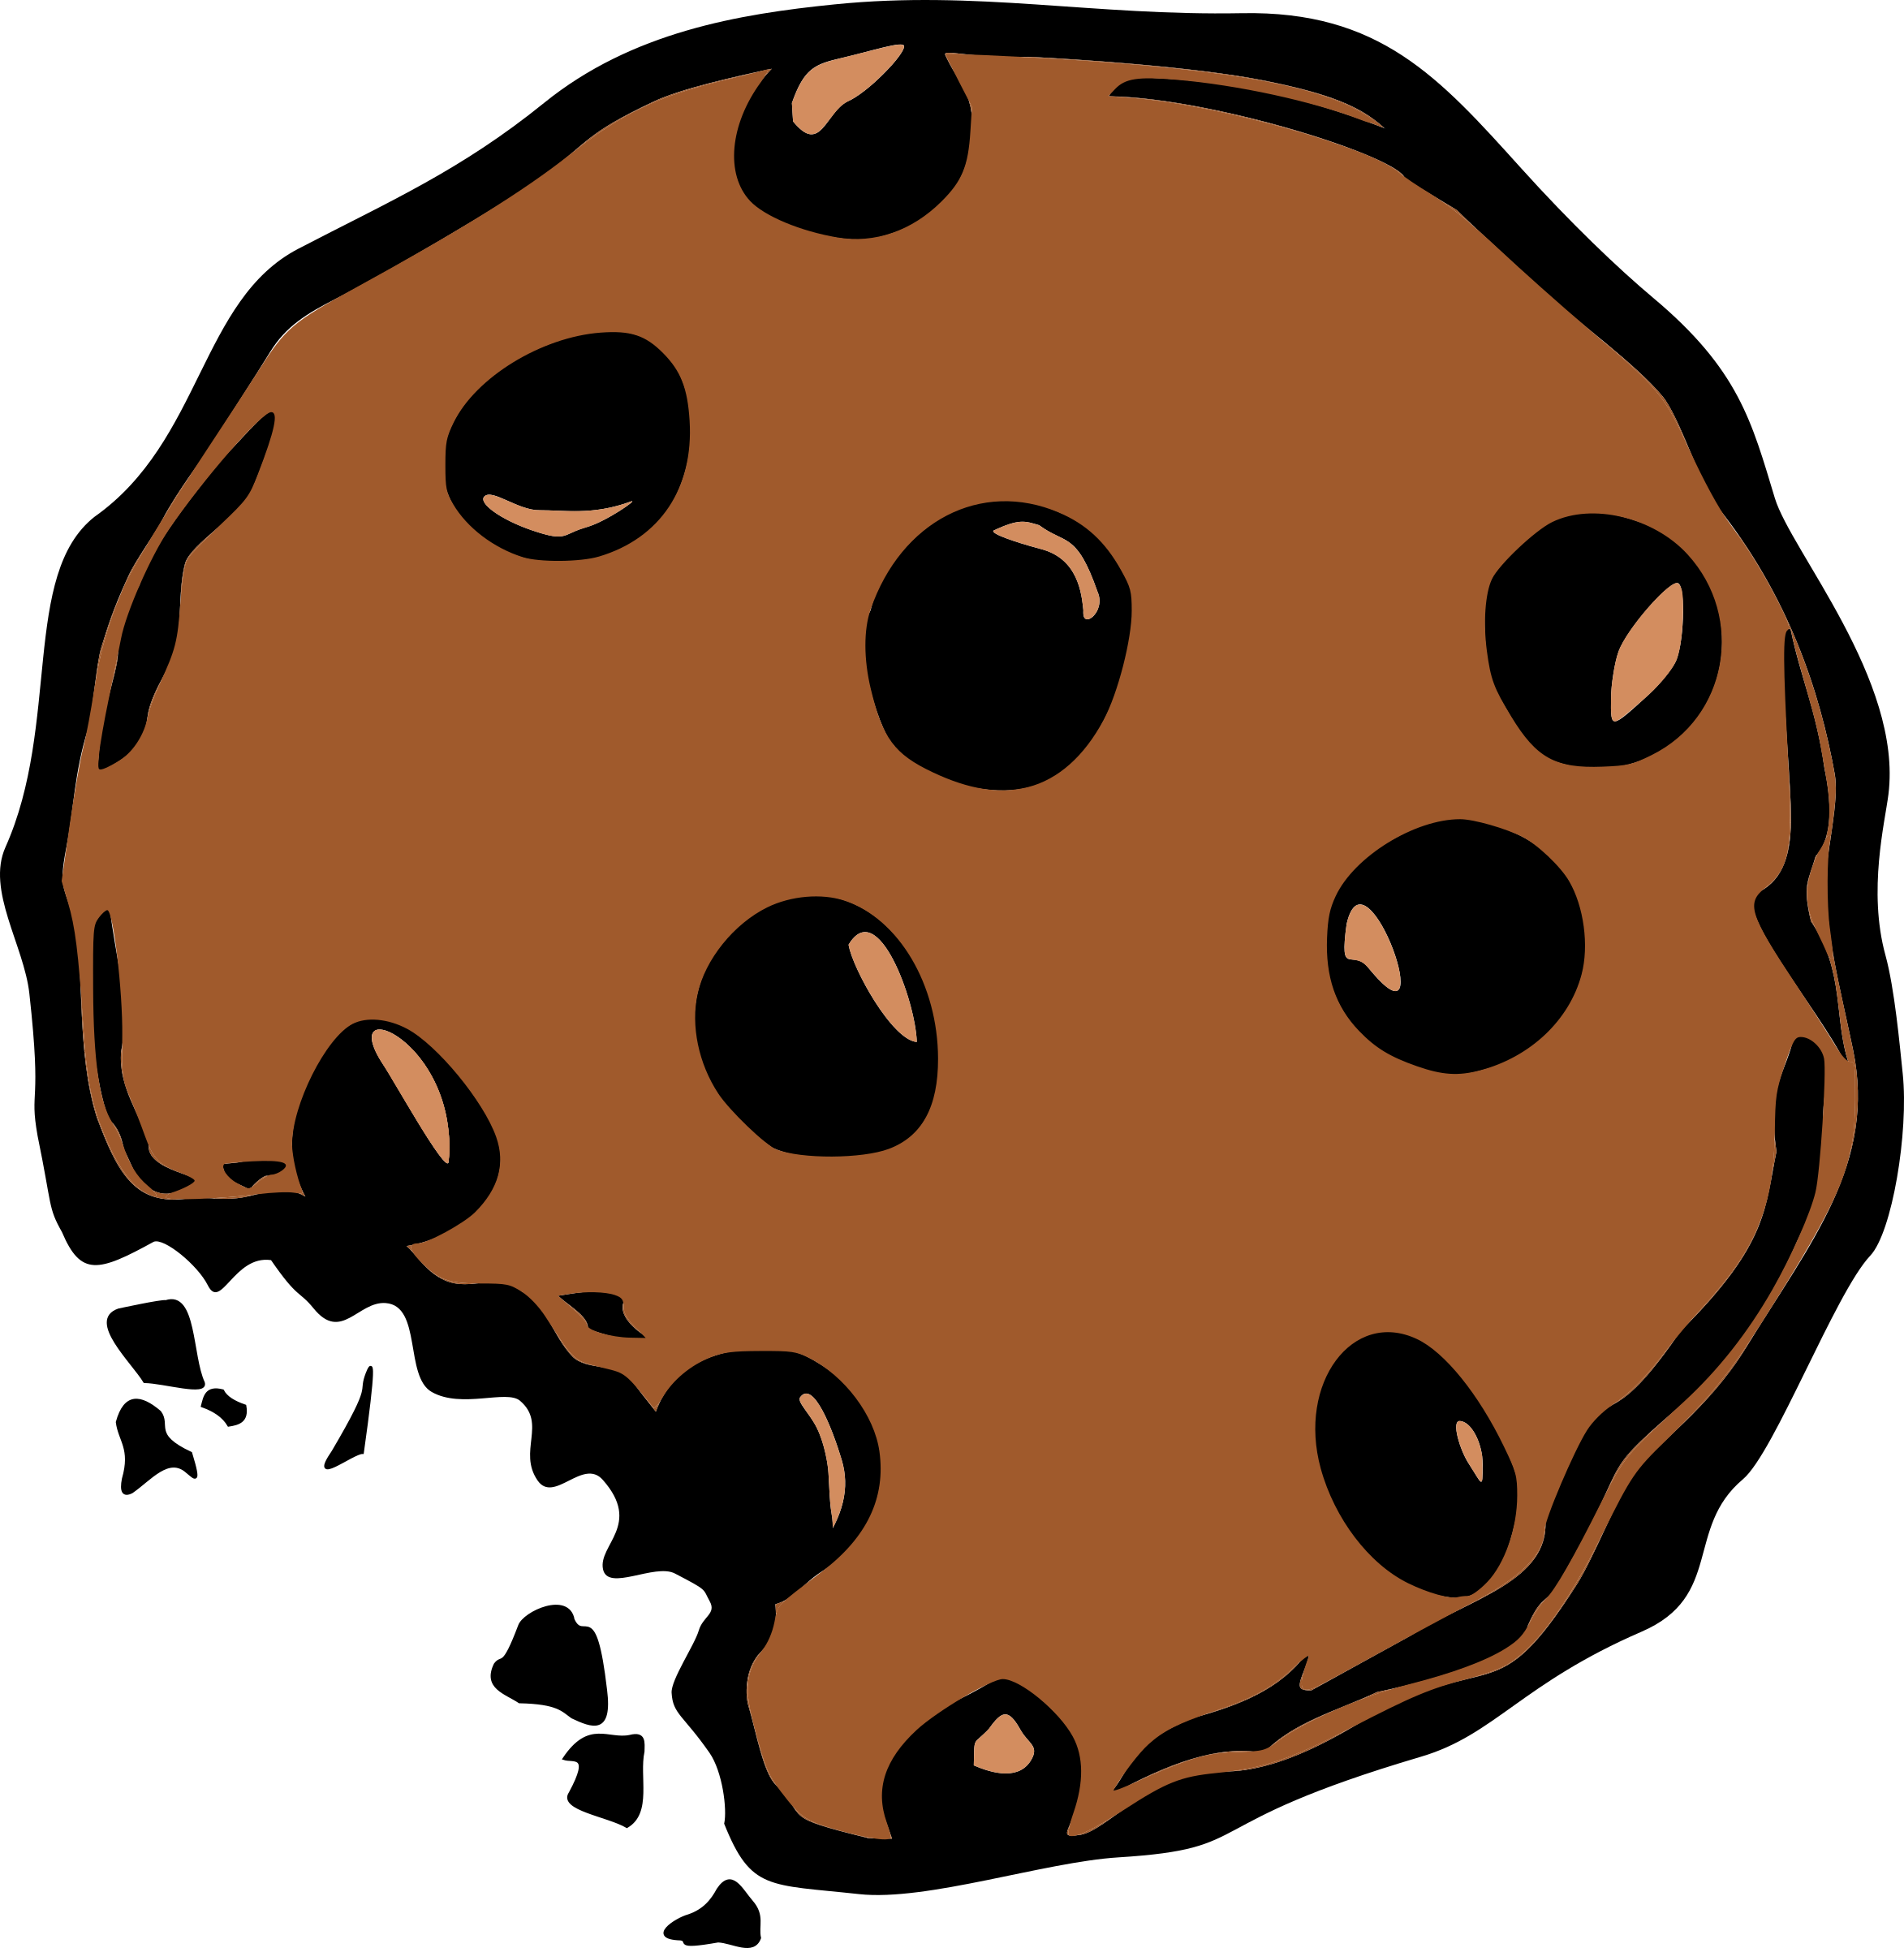 Cokie clipart image transparent Free Cookie Cliparts, Download Free Clip Art, Free Clip Art on ... image transparent